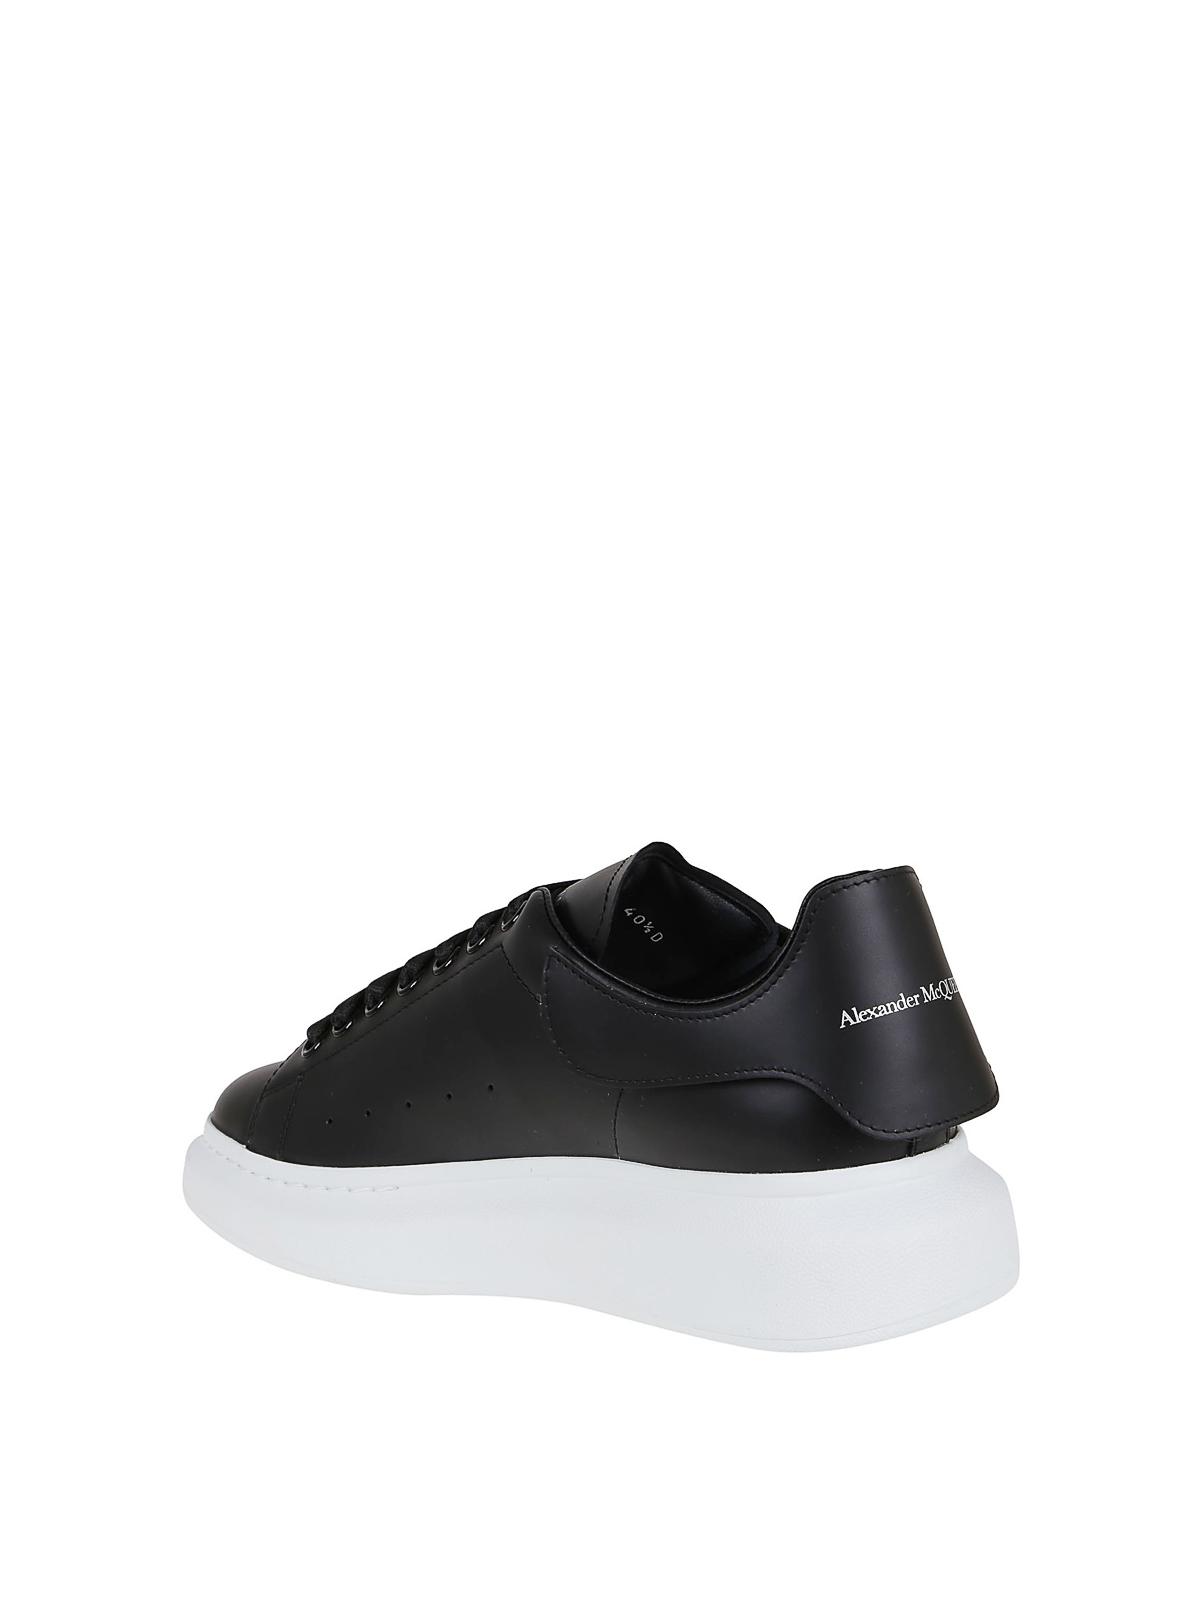 Oversize interchangeable heel tab